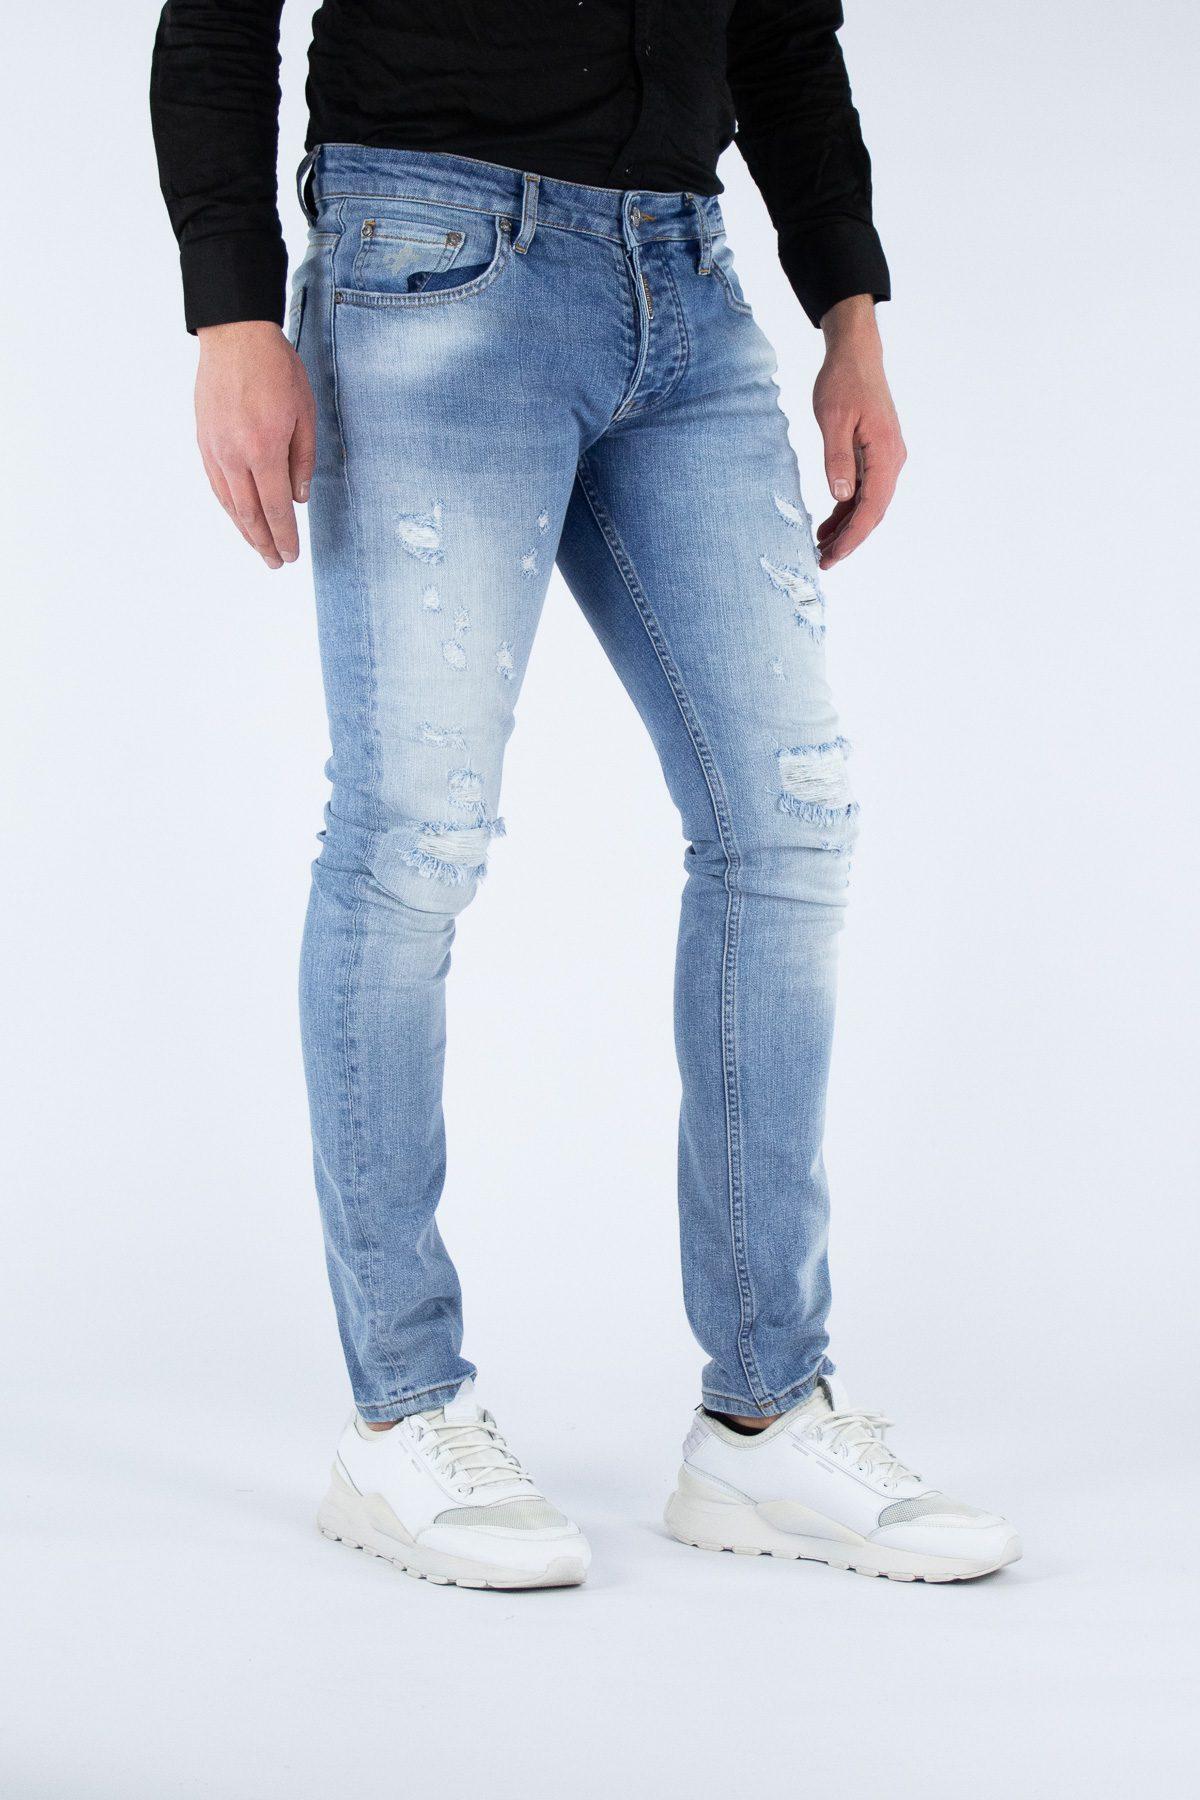 Clarity Light Blue Jeans – 2241-6-2